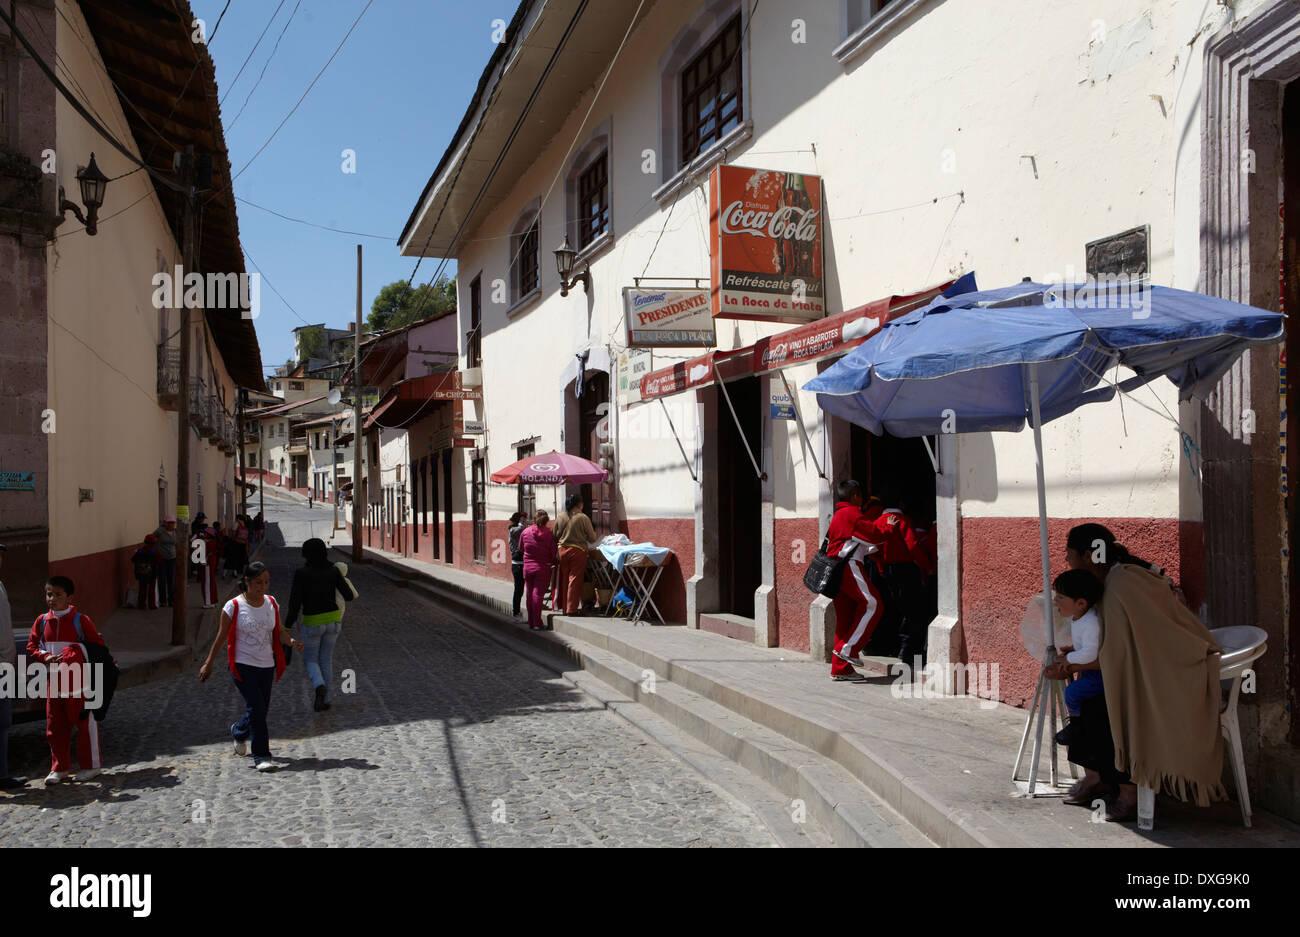 America, Mexico, Michoacán state, Angangueo village - Stock Image